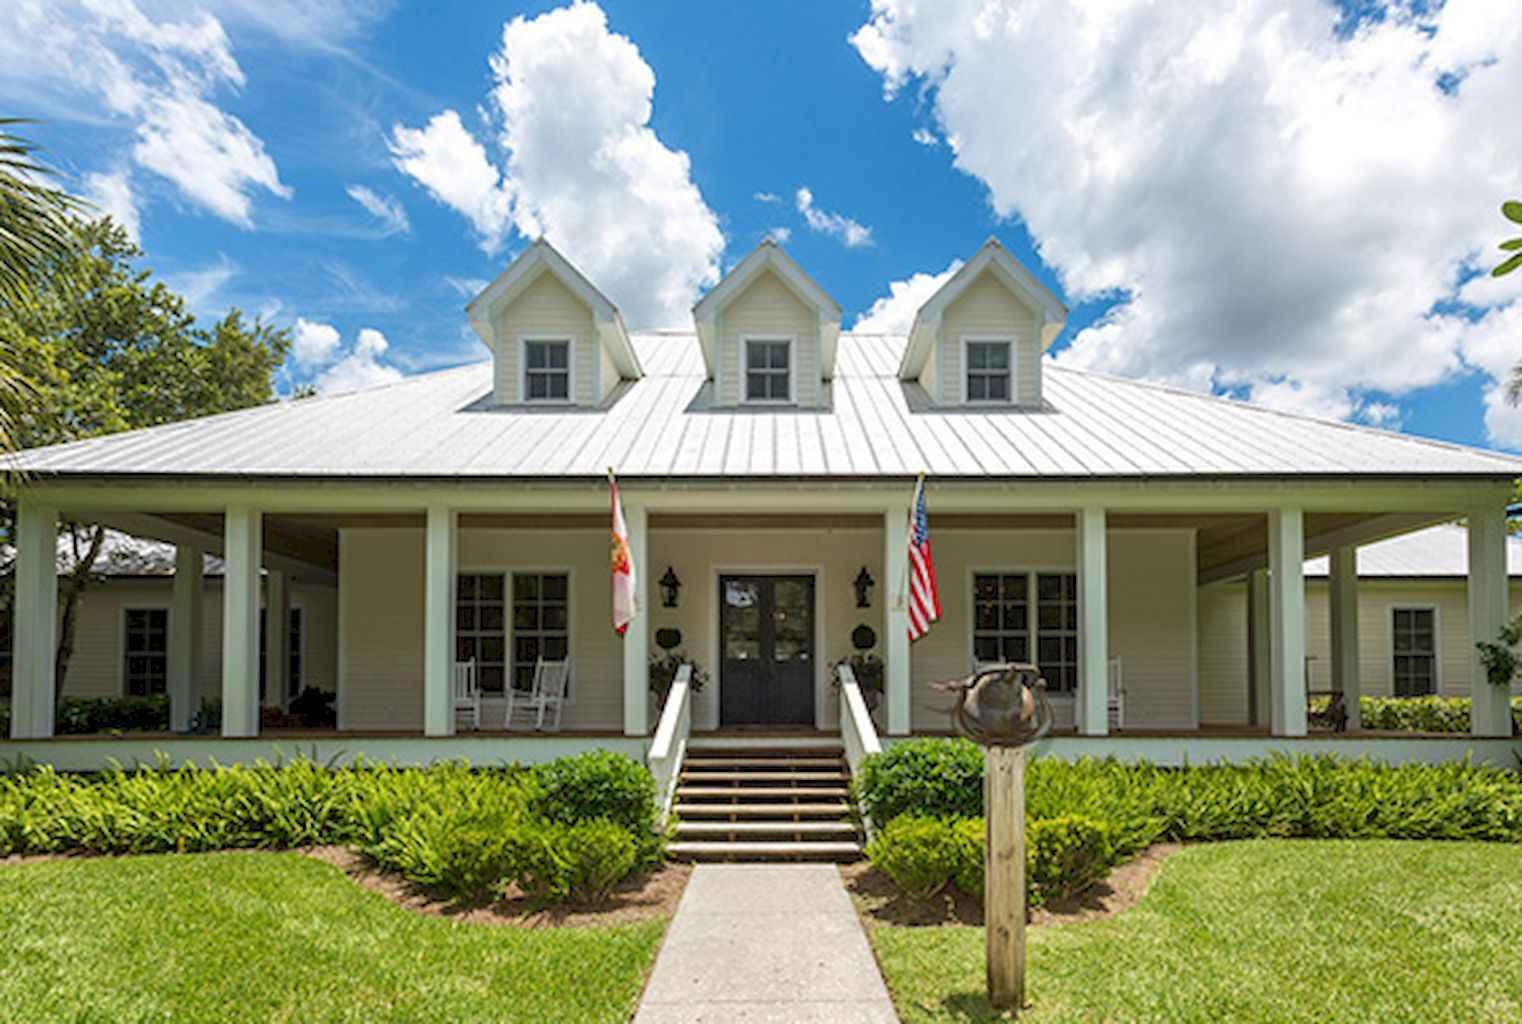 60 amazing farmhouse plans cracker style design ideas (6)